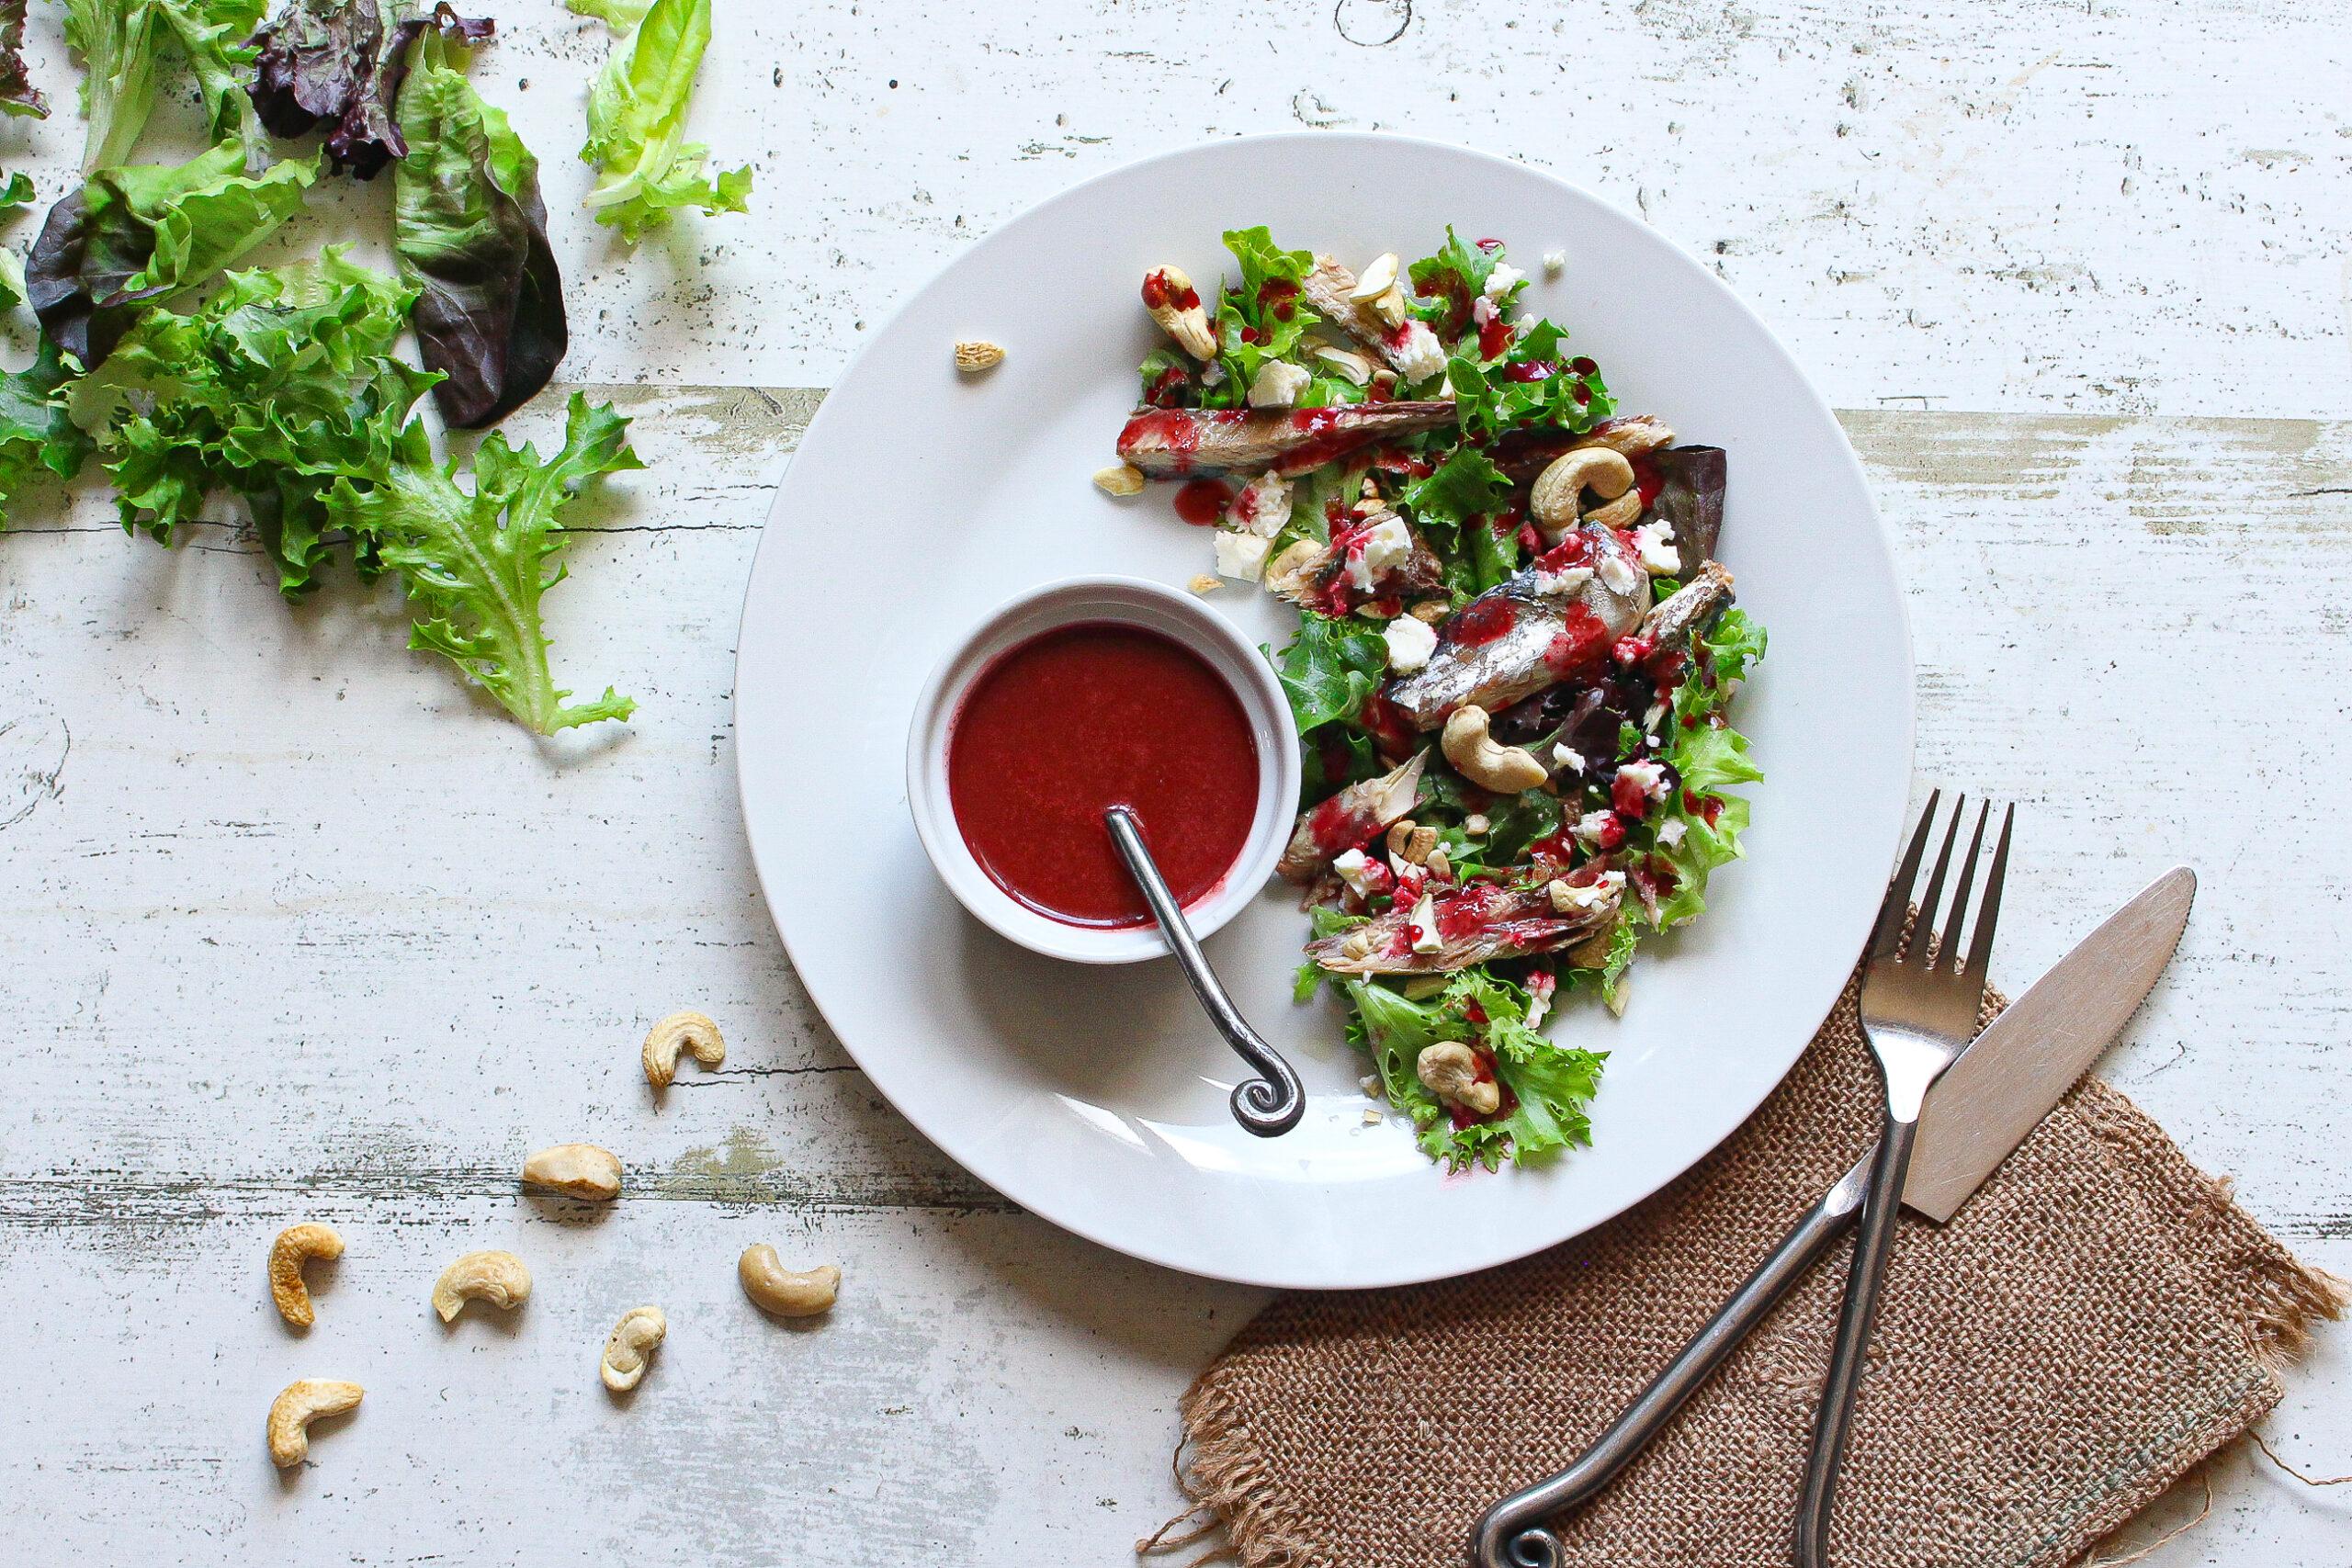 Mackerel and Cashew Nut Salad with Beetroot Vinaigrette